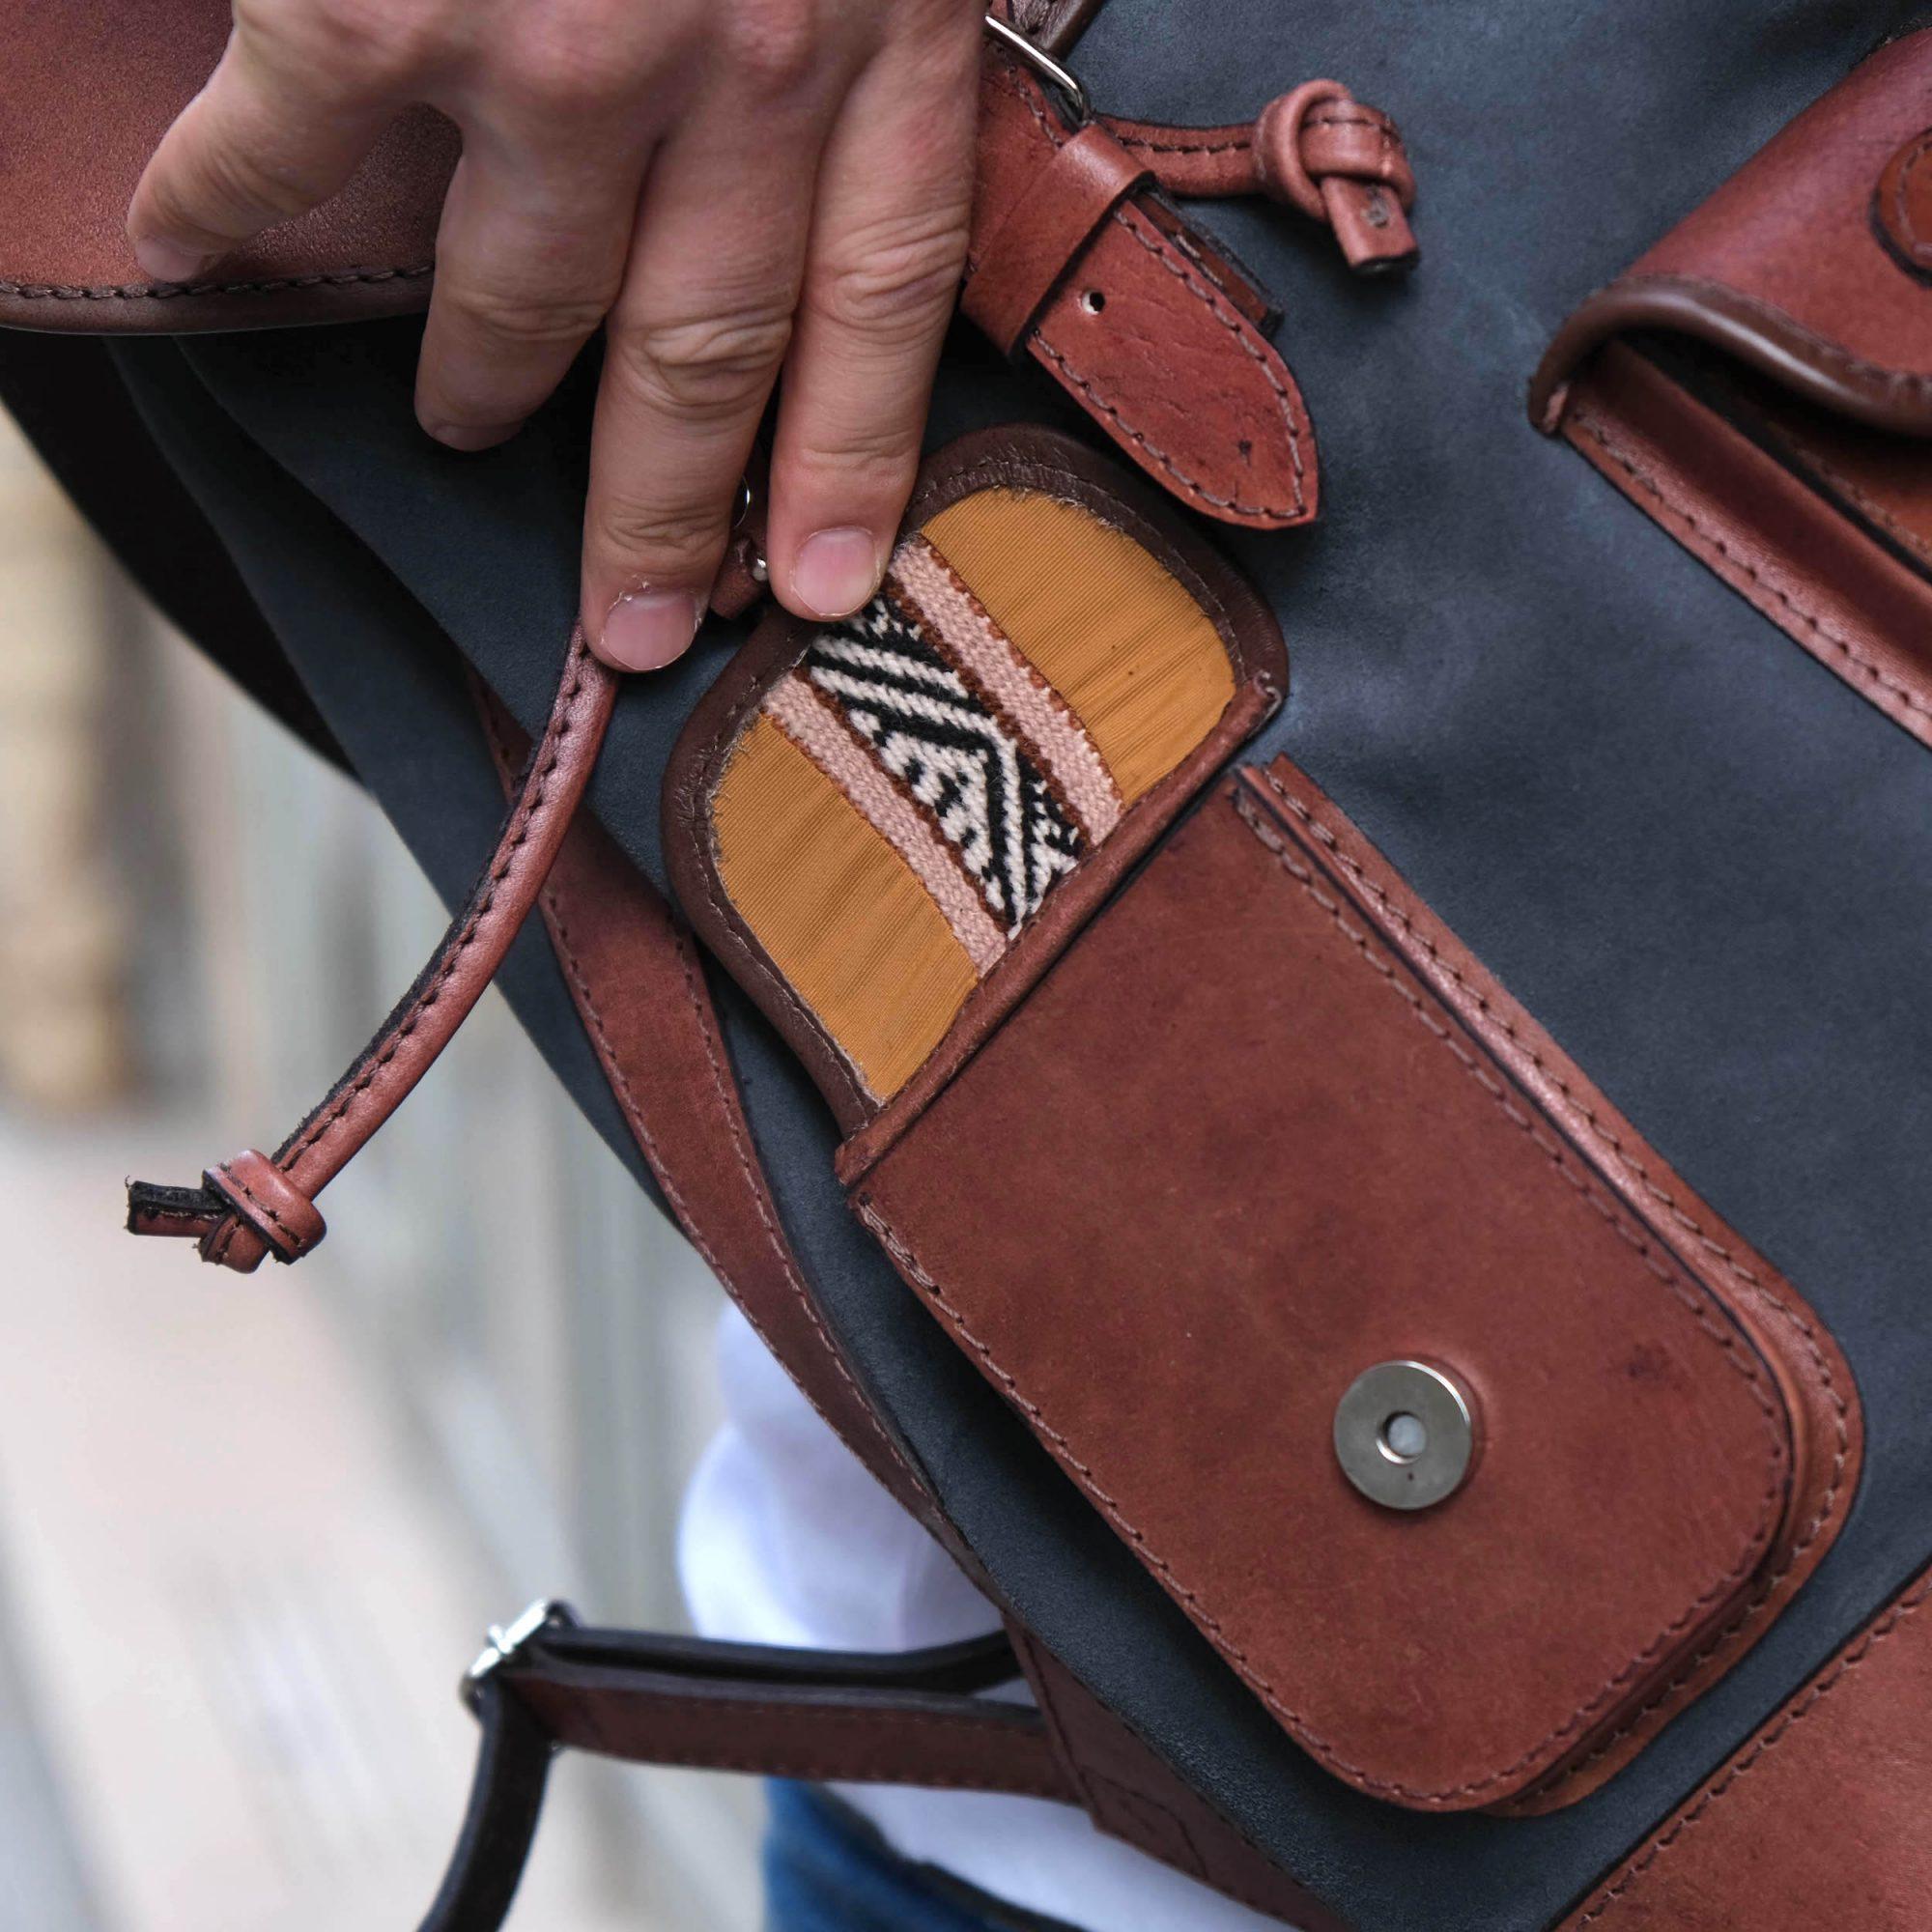 petite poche sac